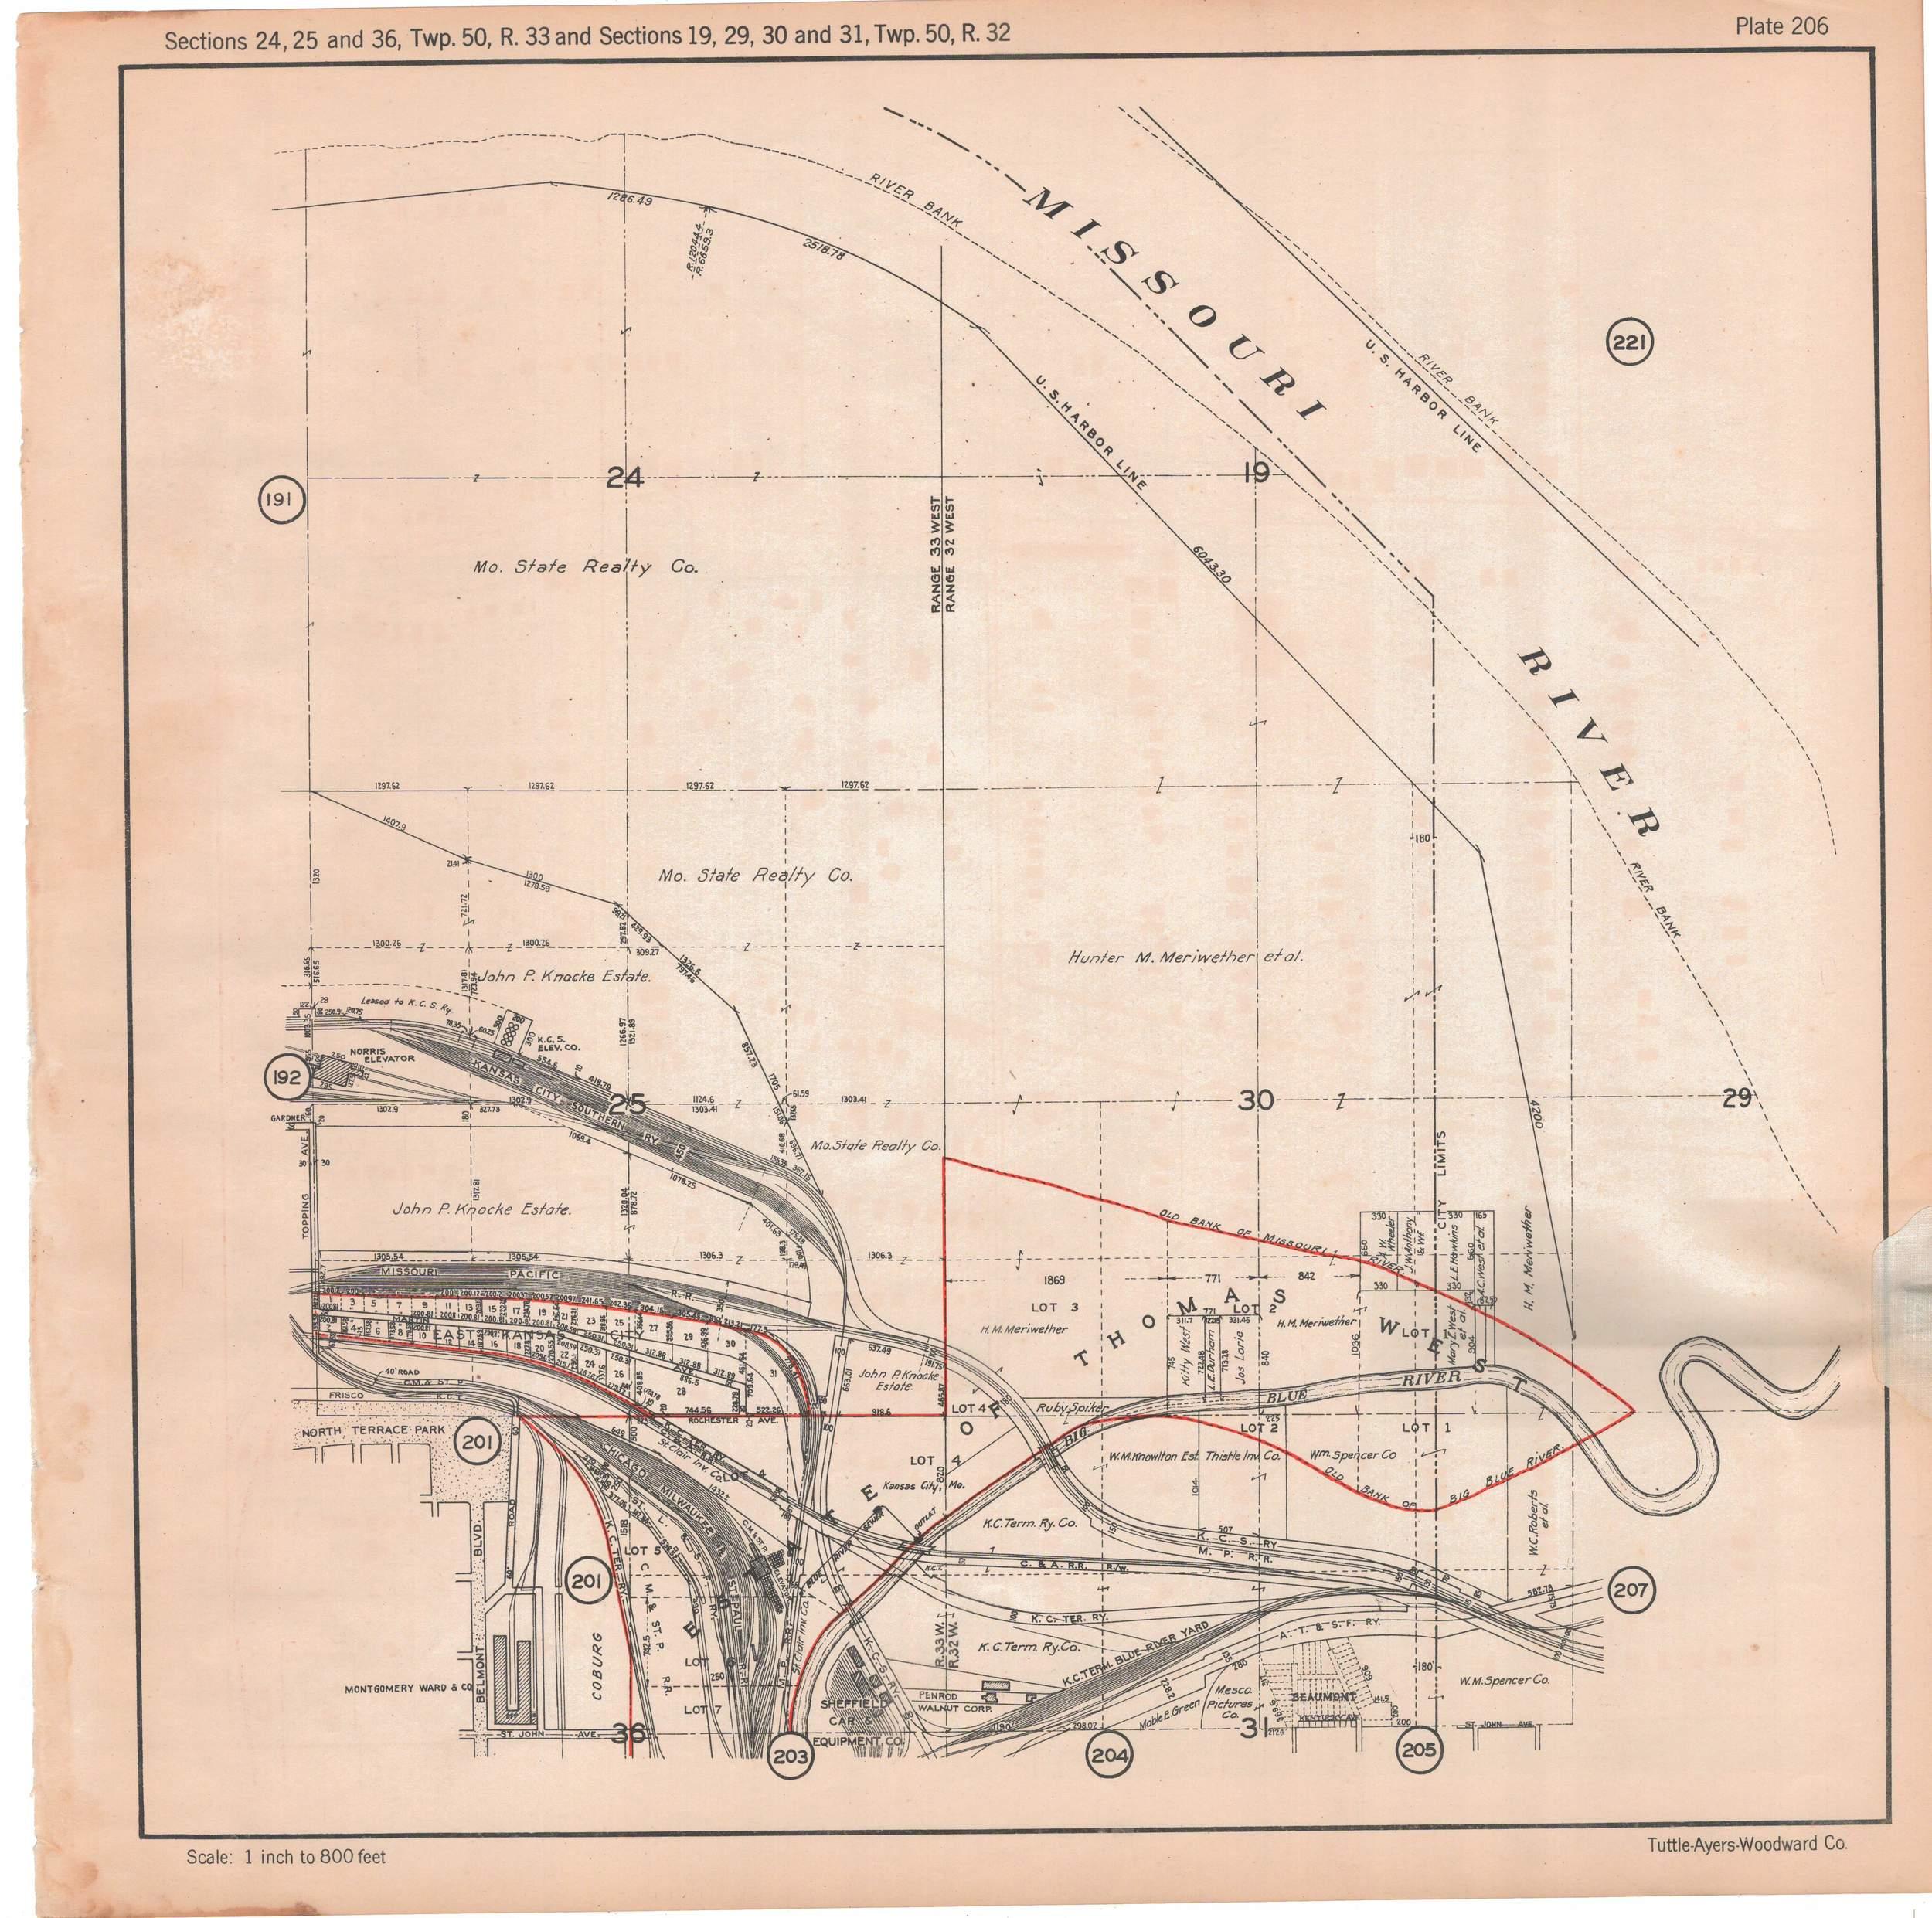 1925 TUTTLE_AYERS_Plate_206.JPG